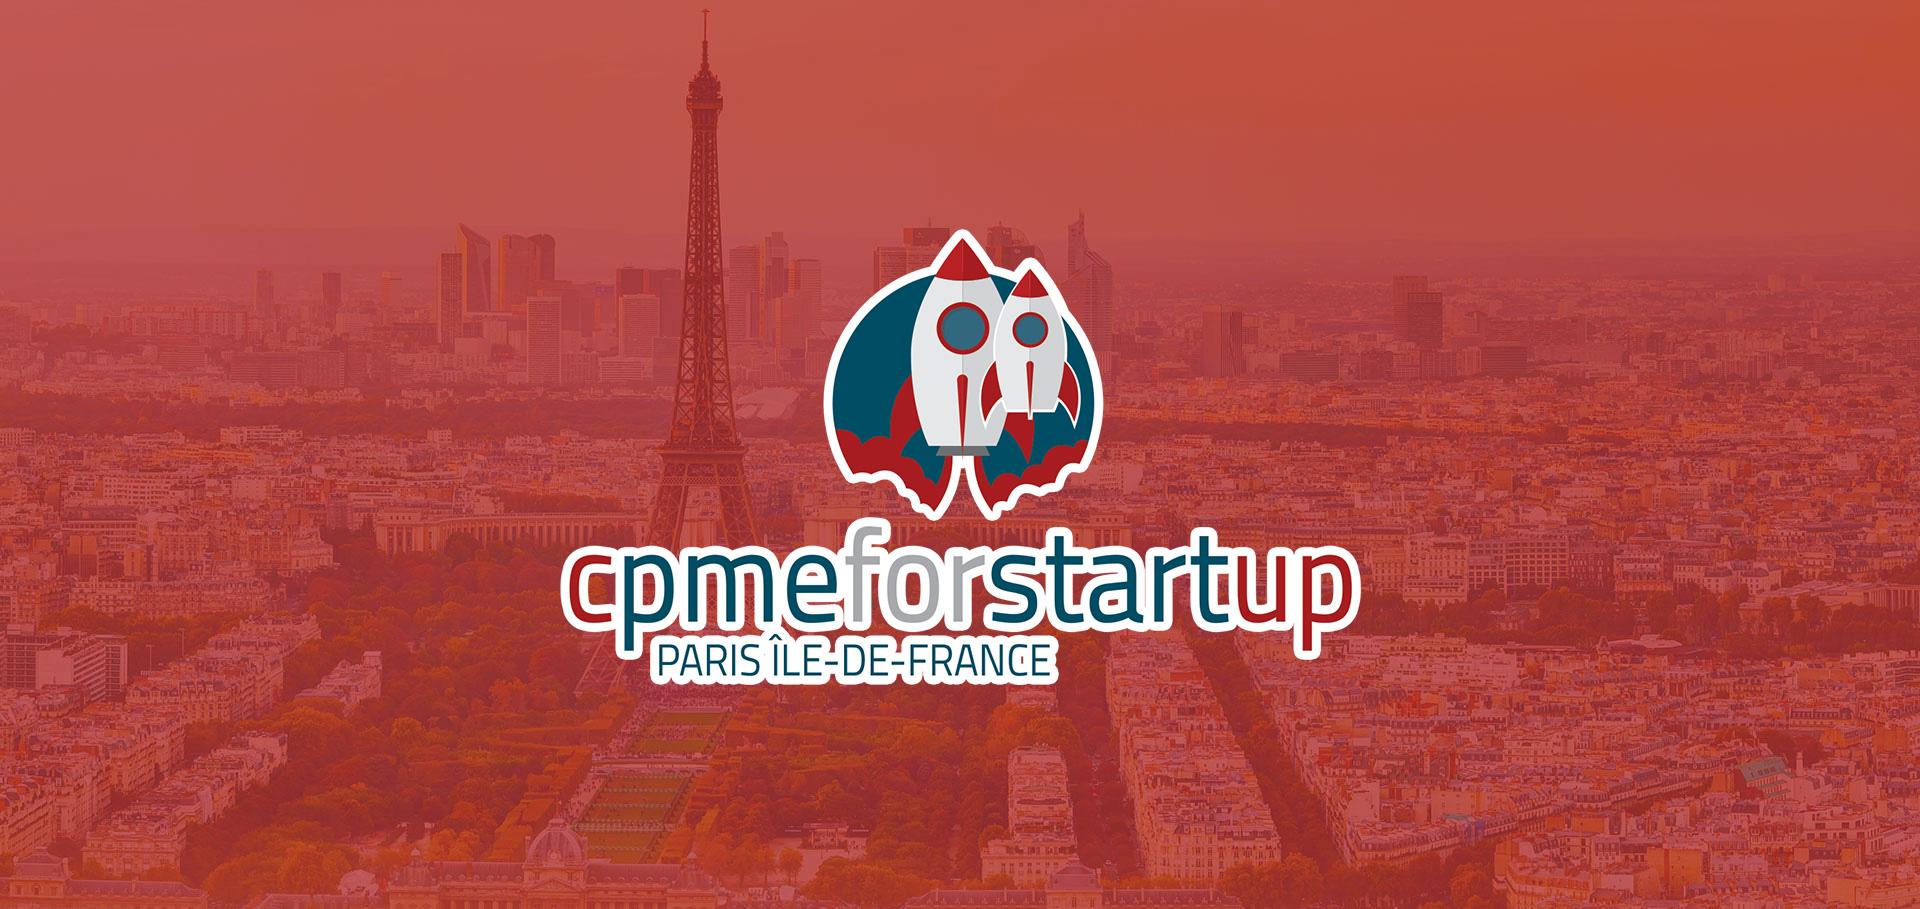 CPME for Startup, startups